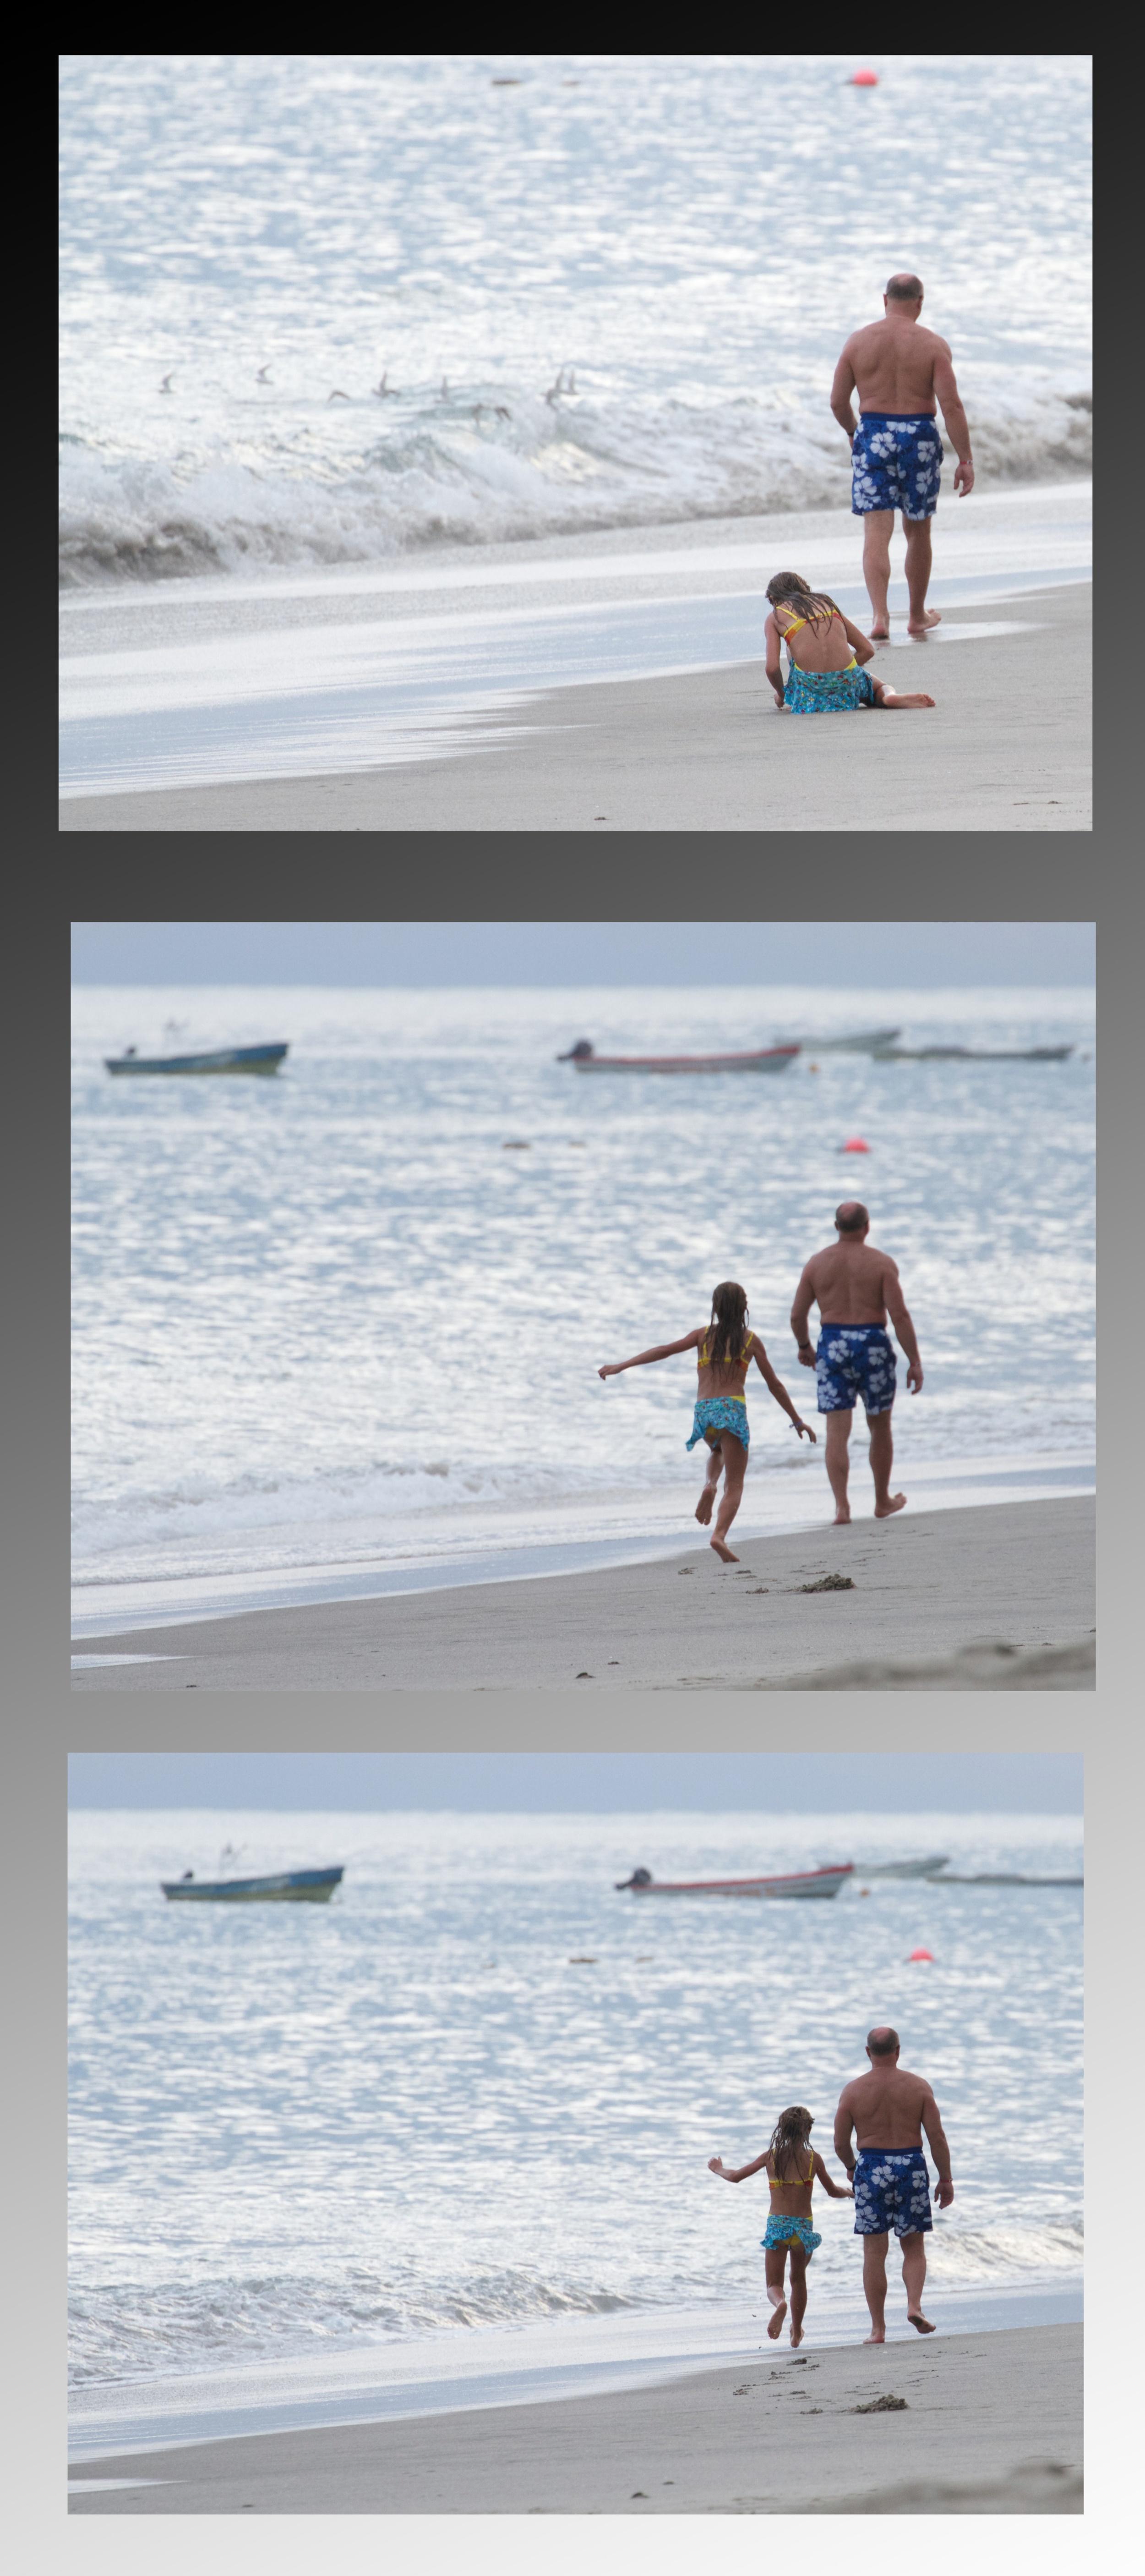 2012-12-30 at 04-51-06 Beach, Granddaughter, Grandfather, Ocean, Play, Portraits, Run.jpg